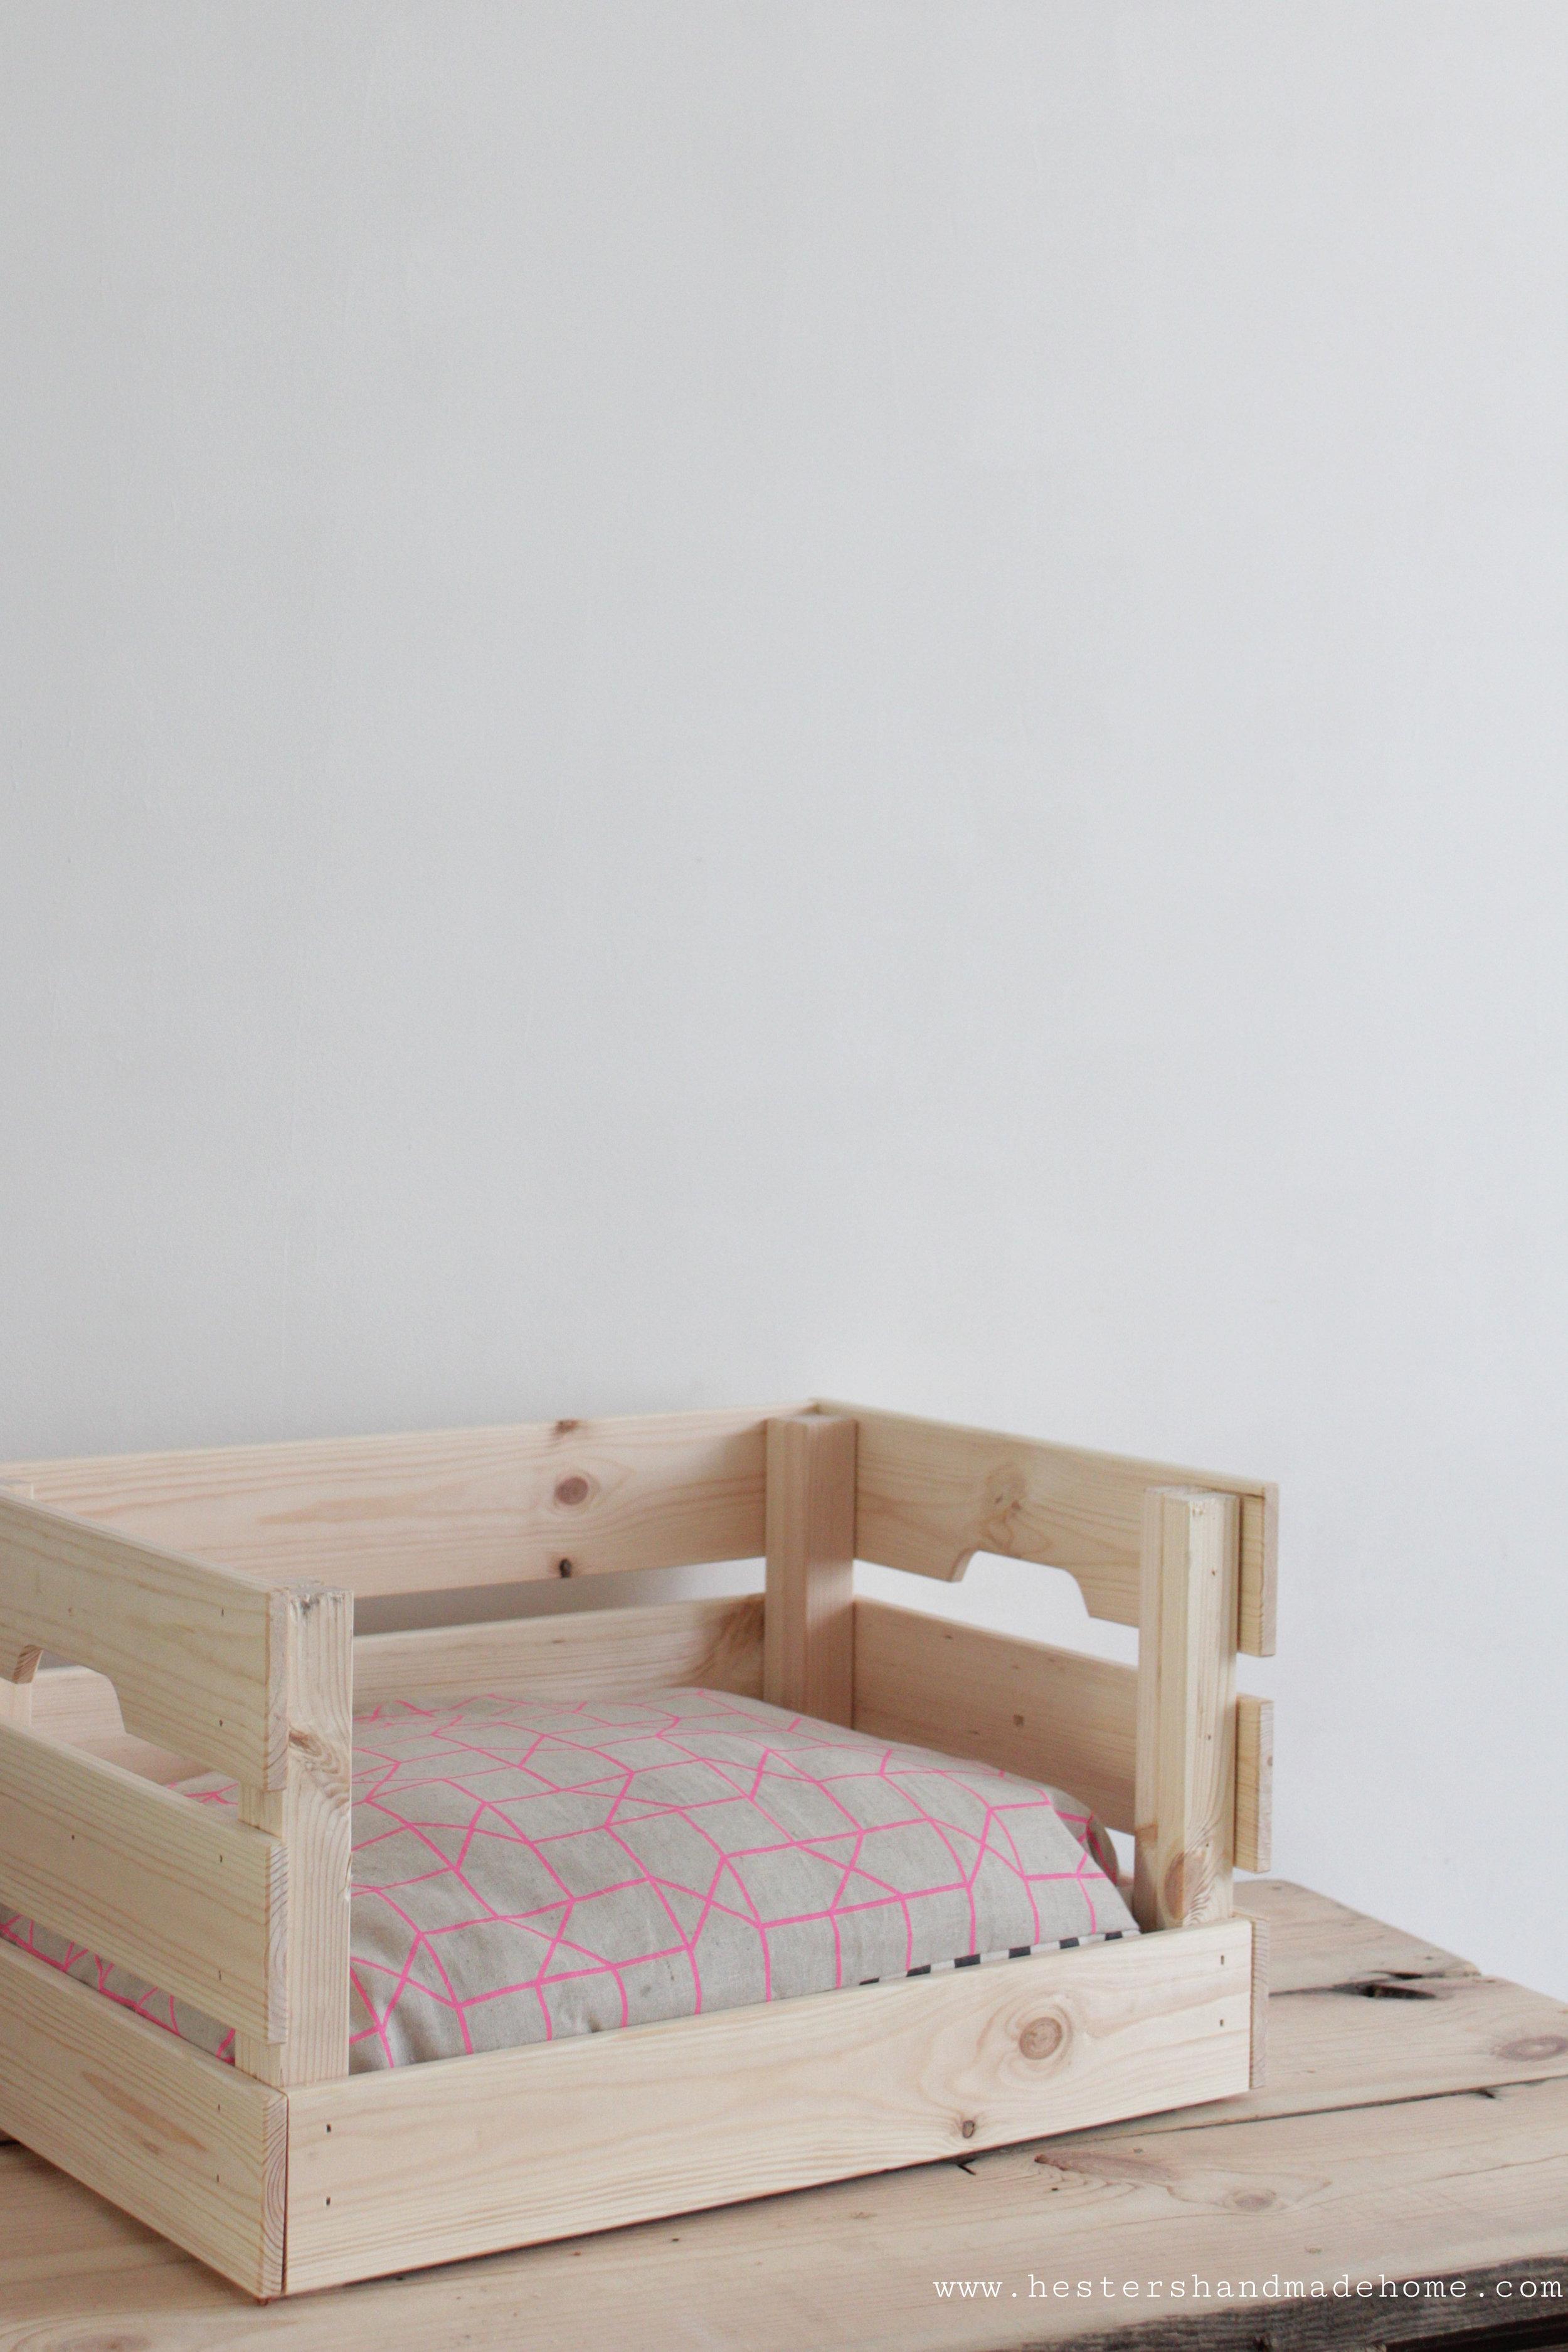 Ikea pet bed hack by www.hestershandamdehome.com